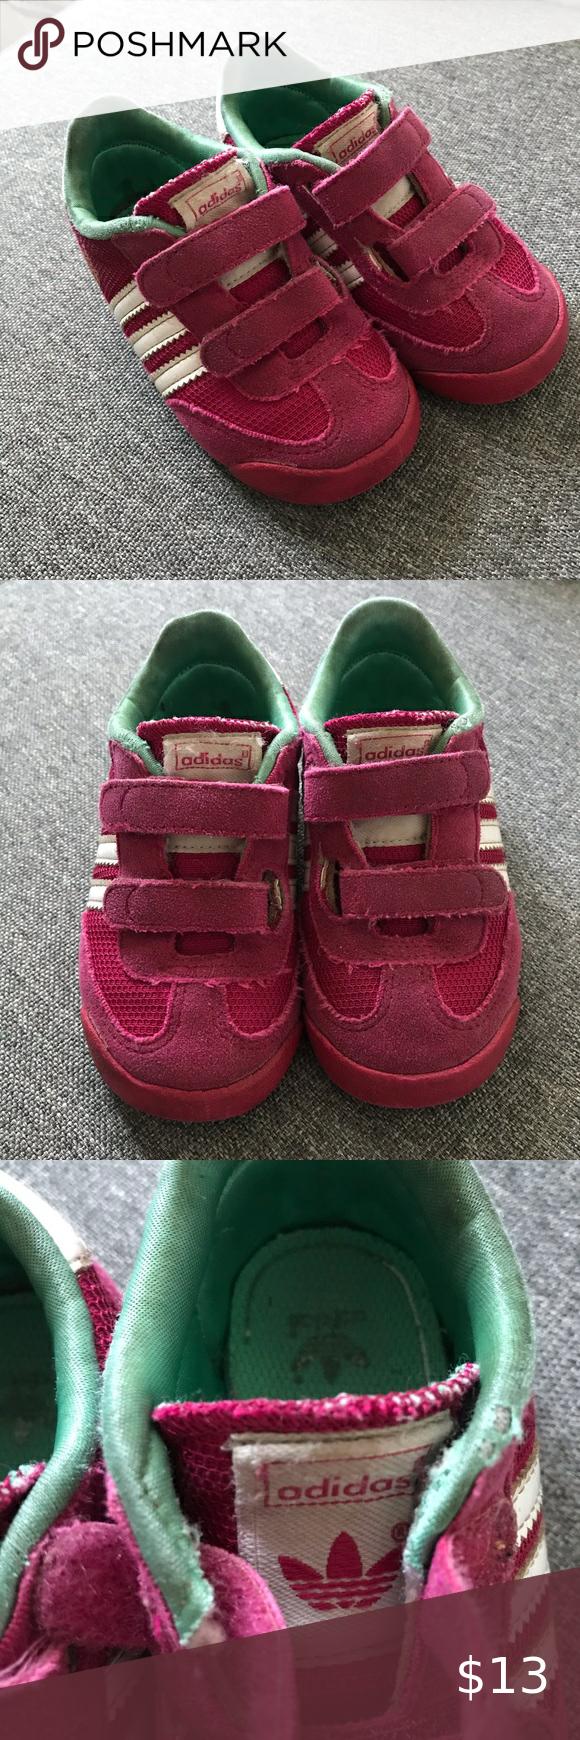 Girls adidas dragon trainers | Adidas dragon, Adidas girl, Pink adidas